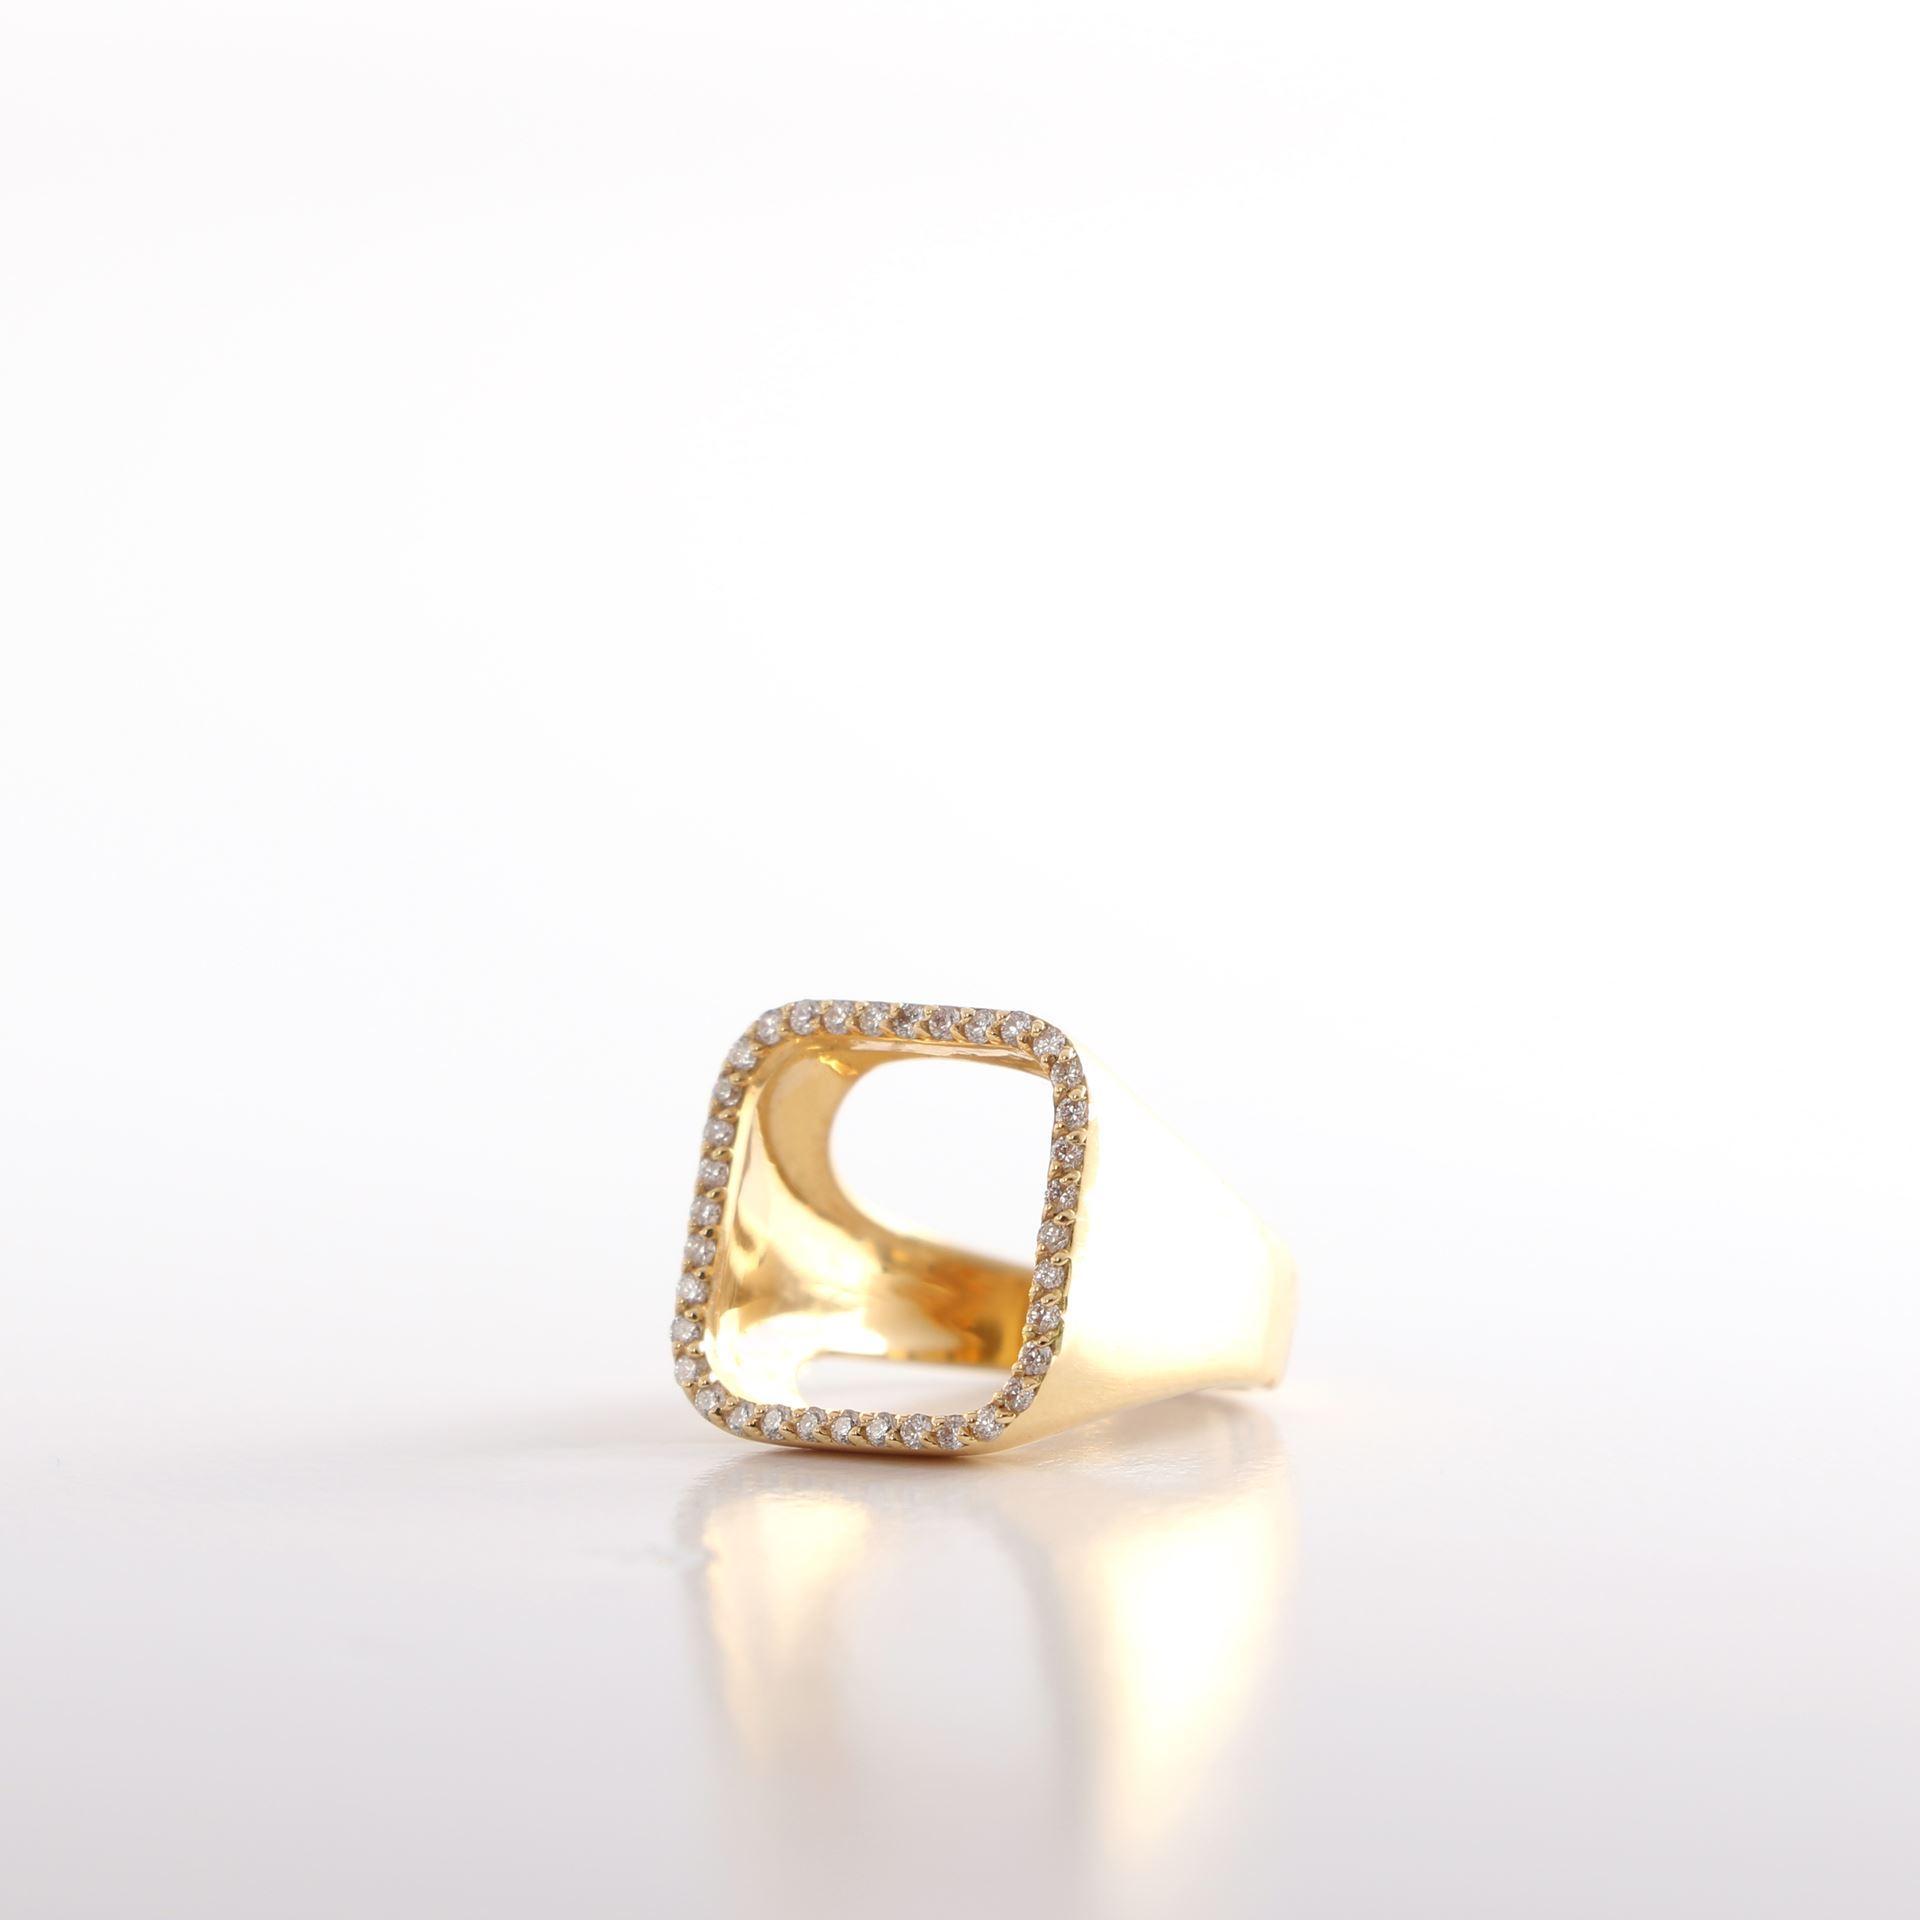 Diamond Ring Price Lebanon